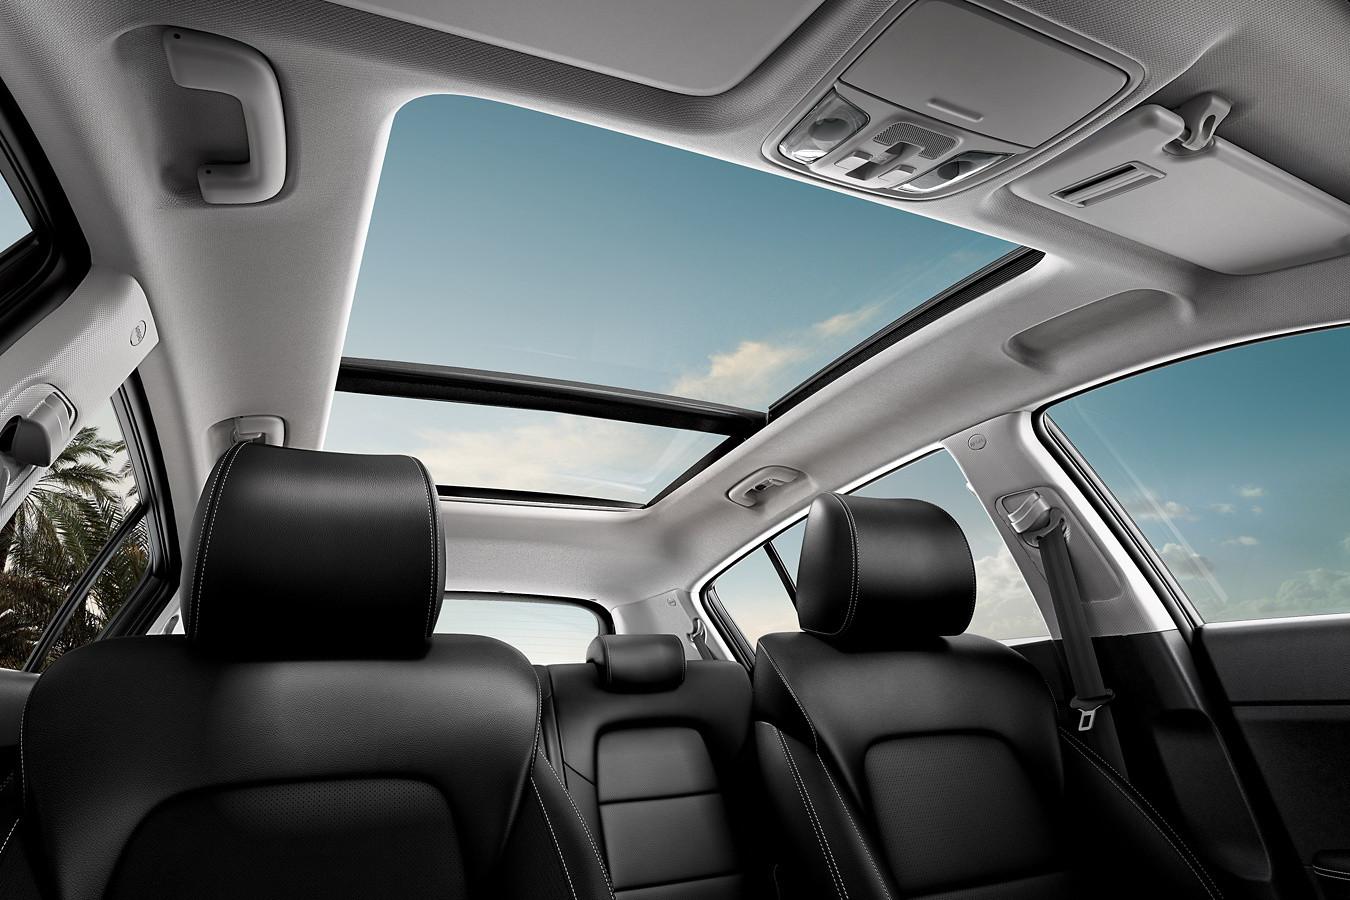 Stunning Views From the 2020 Kia Sportage